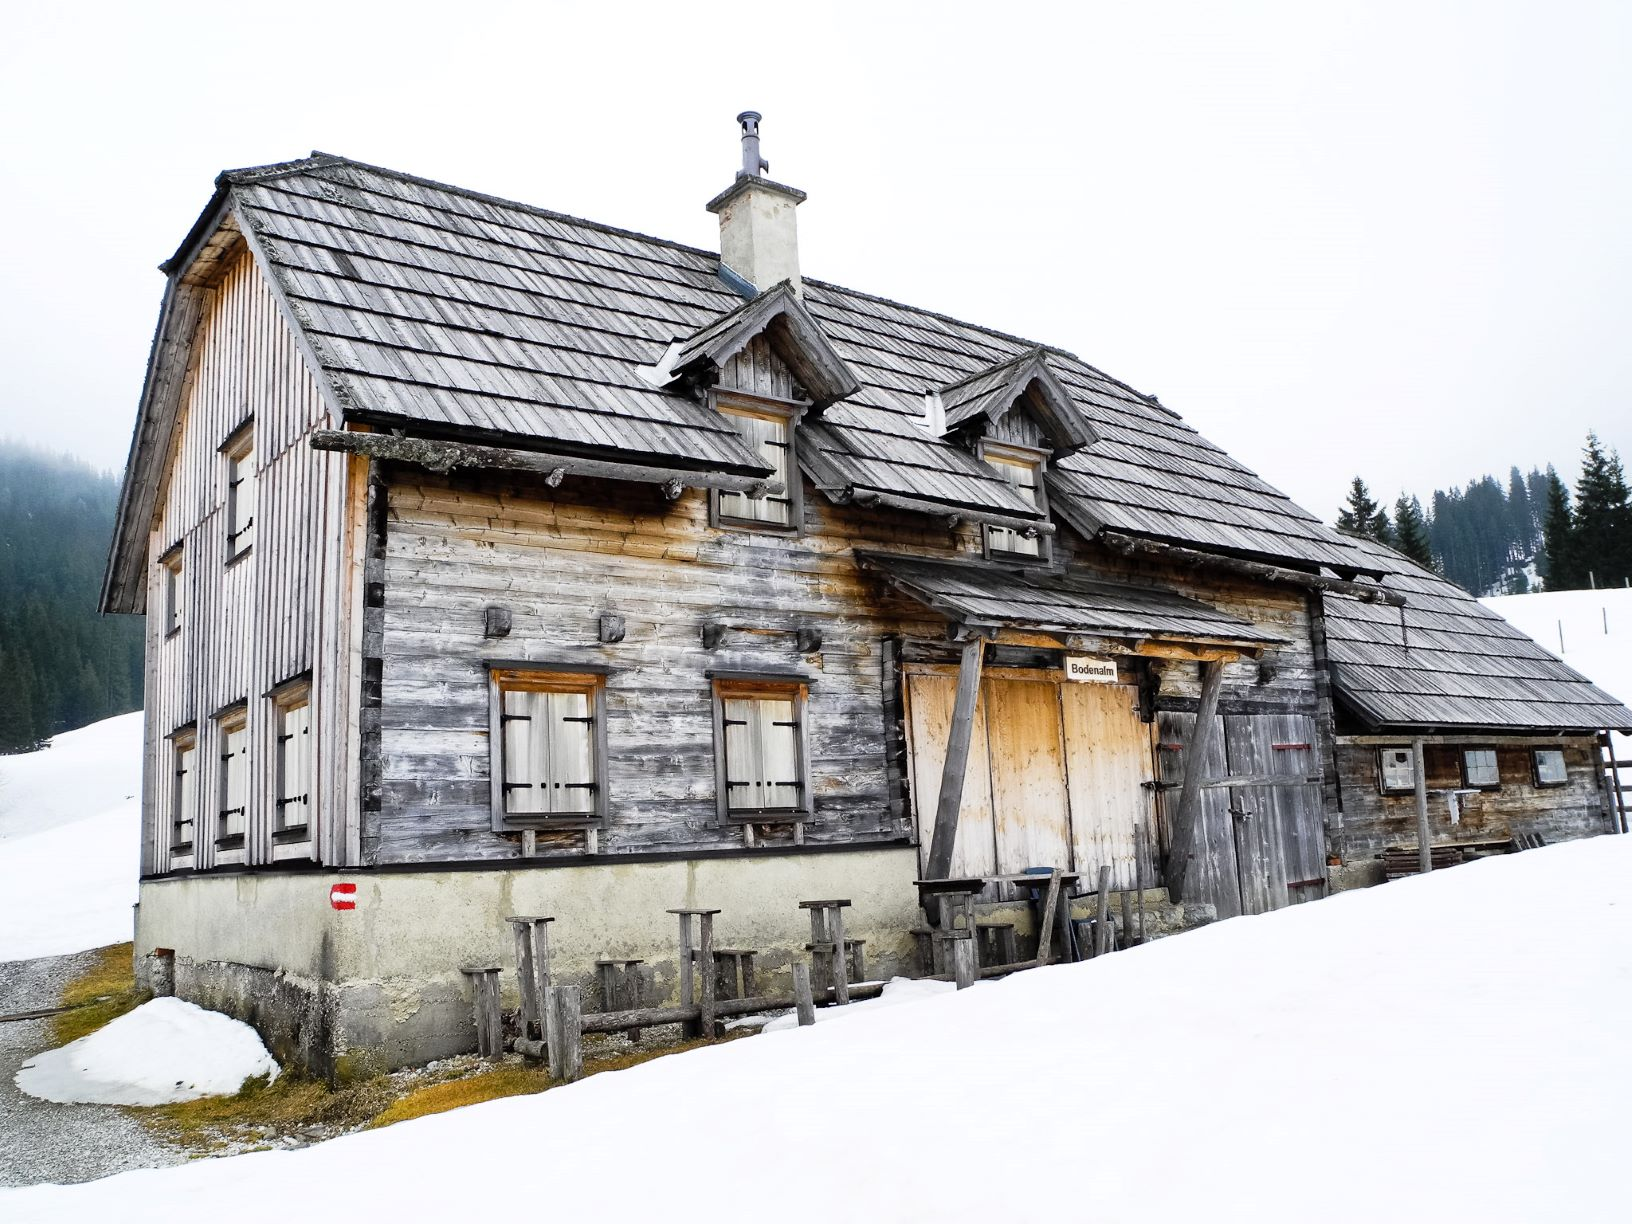 Etappe 10: Krampen – Schneealpenhaus